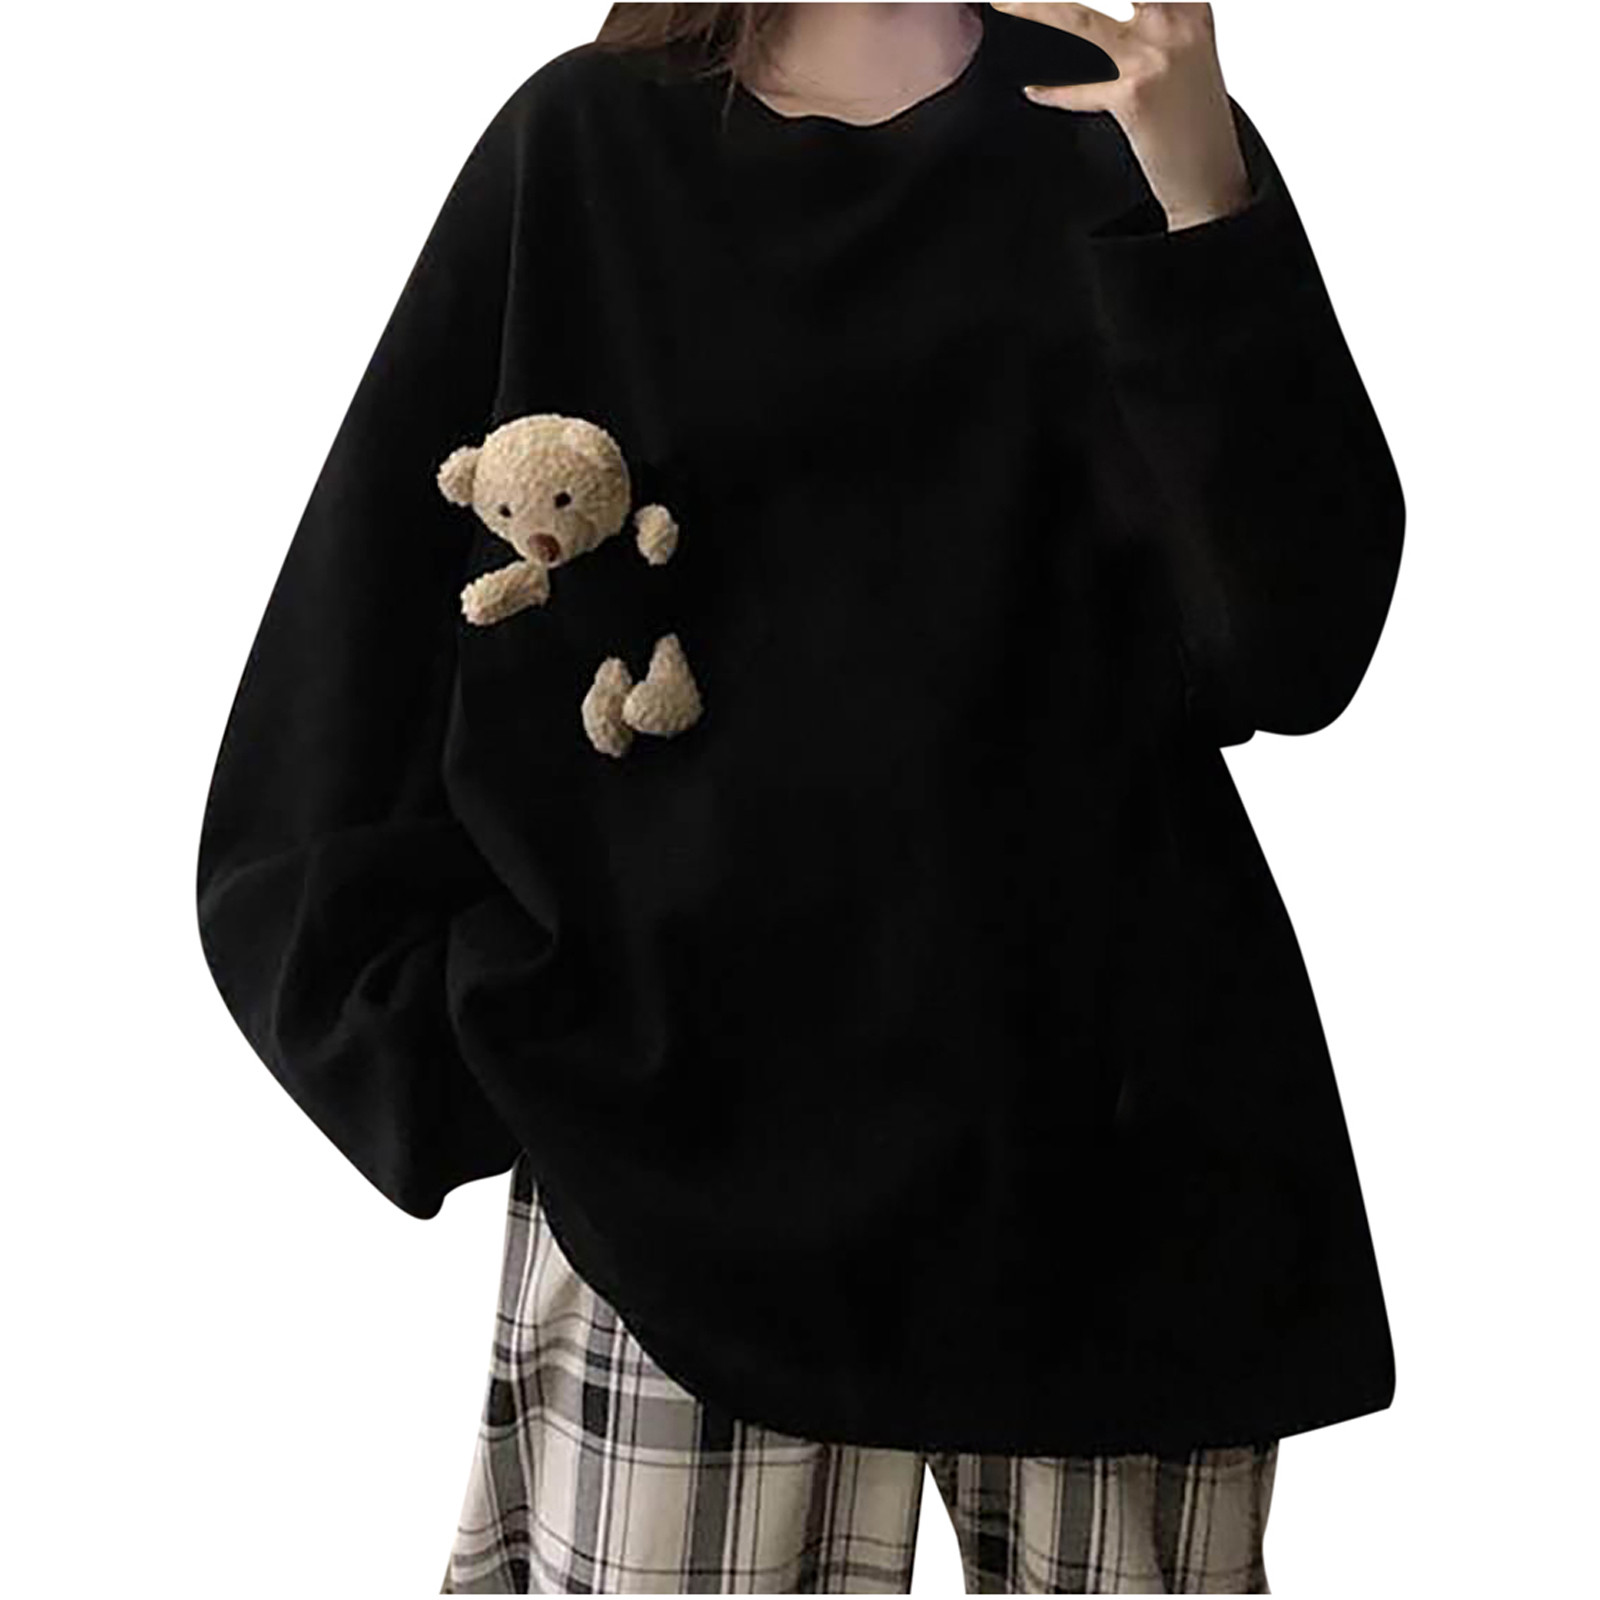 40# Women's Bear pocket Hoodies cute Spring Autumn Loose Wild Pullover Solid Bear Sweatshirt Hoodies Preppy Kawaii Sweatshirts